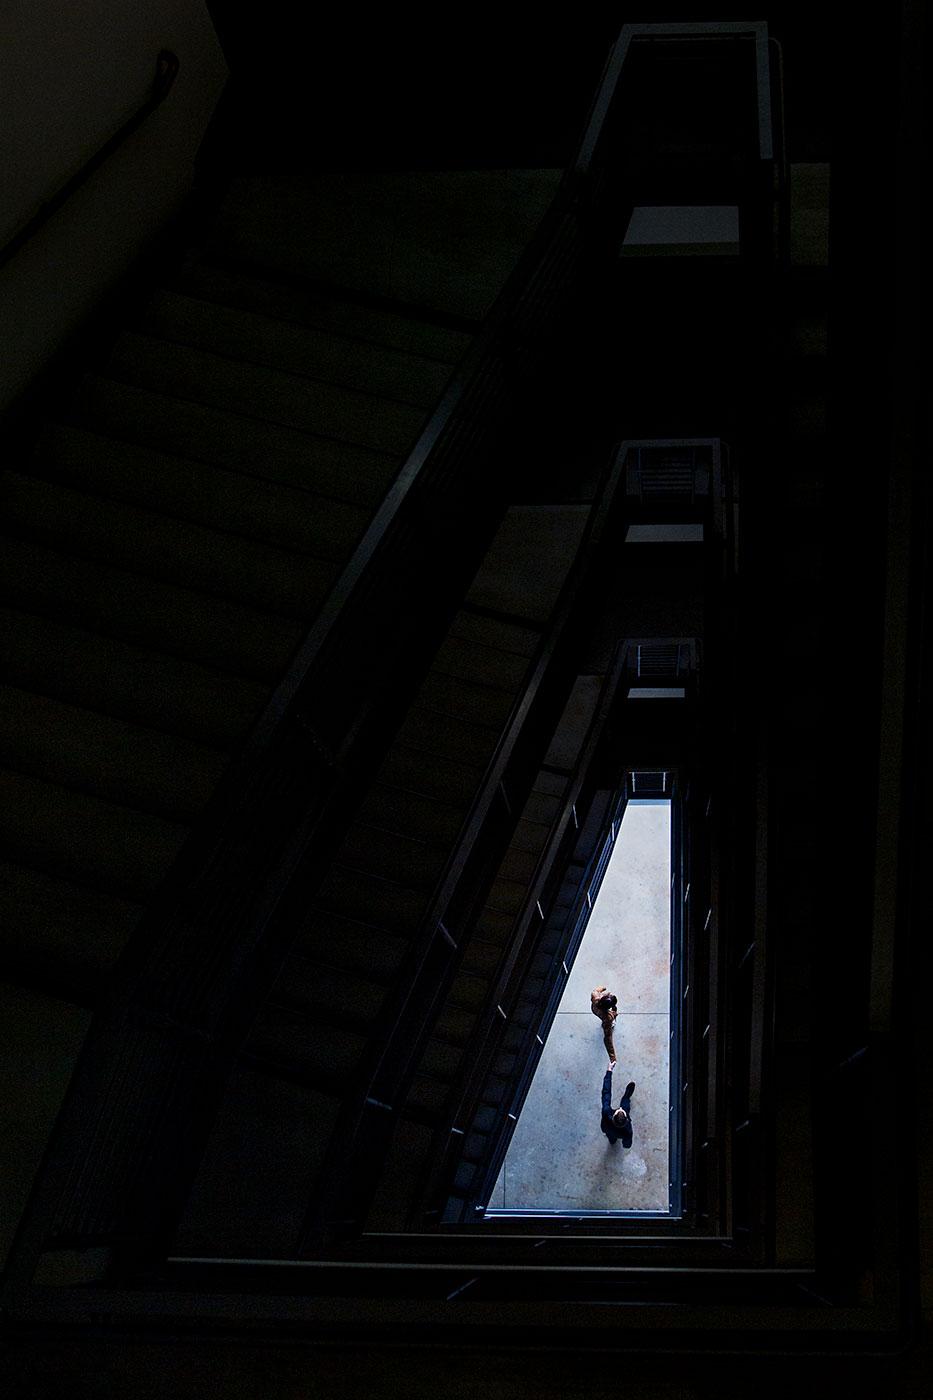 stairs_fine_art_arcata_humboldt_state.jpg